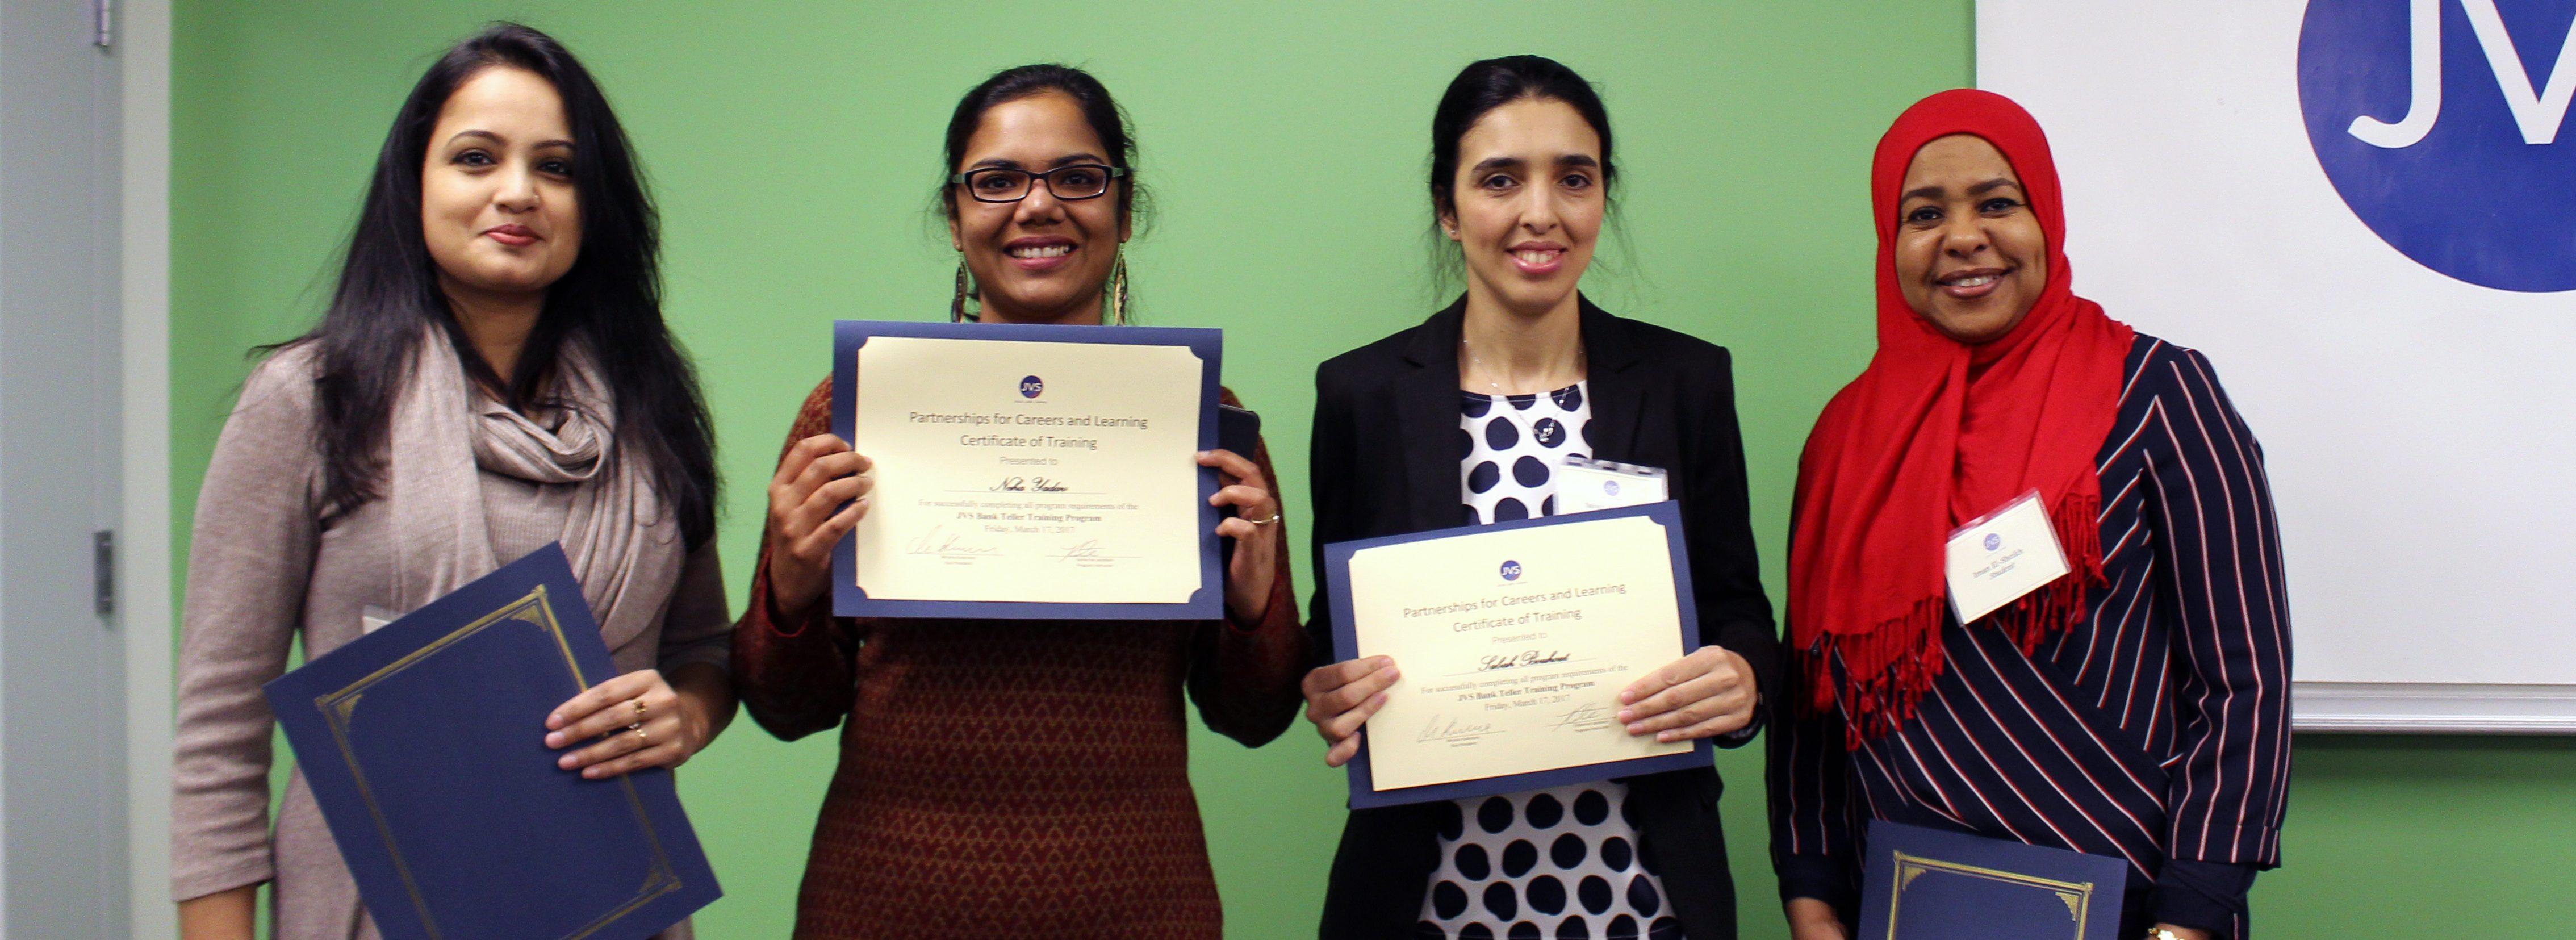 JVS Bank Career Program graduates holding their program completion certificates